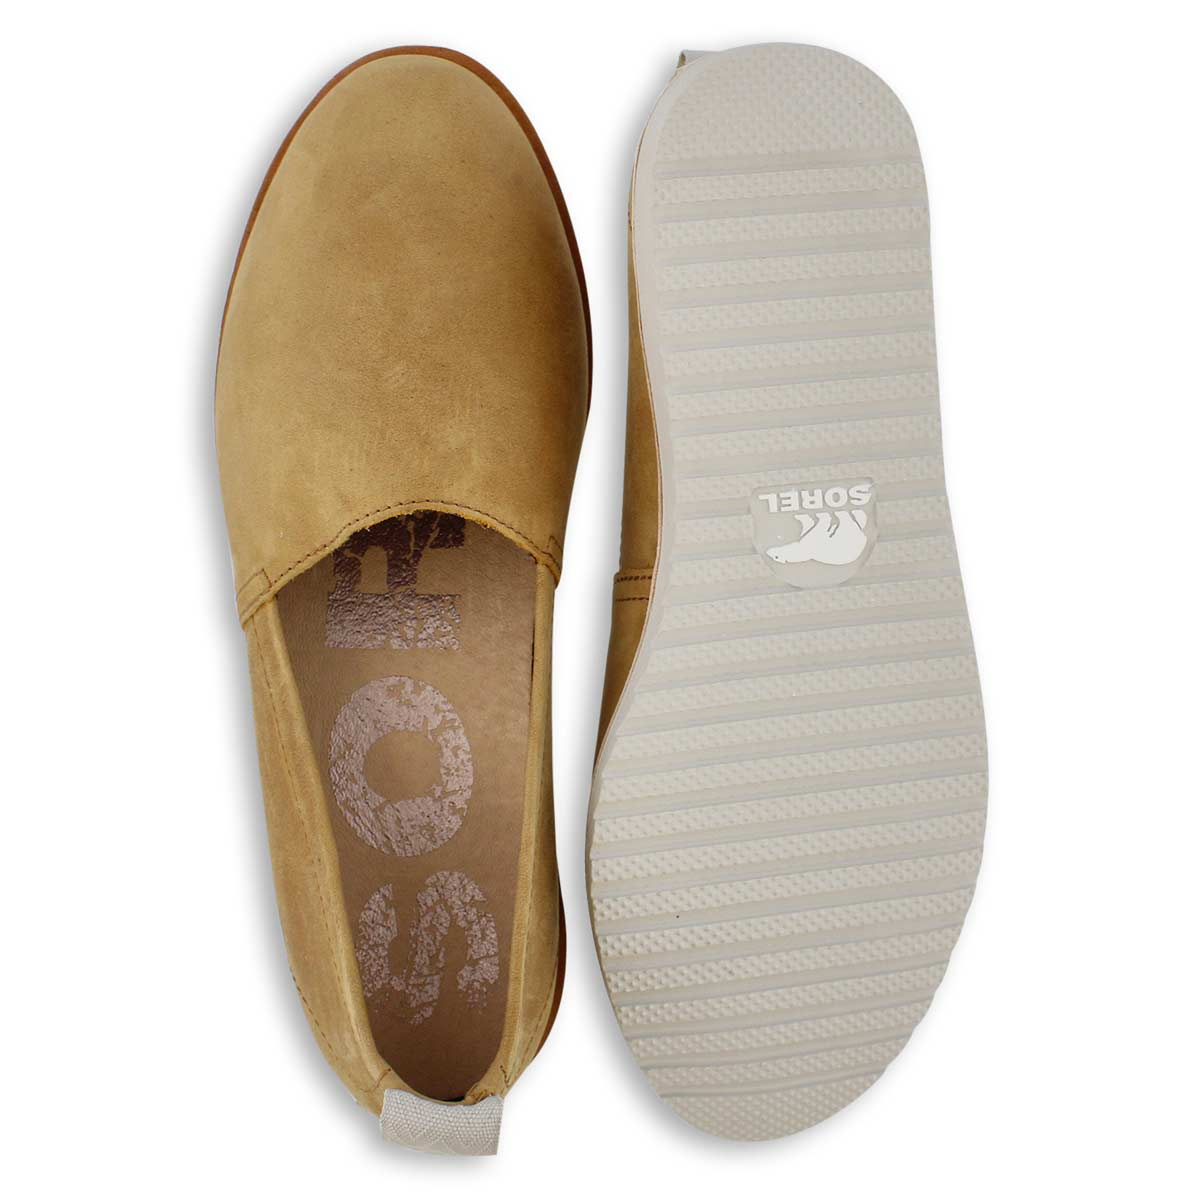 Lds Ella camel brown casual slip on shoe